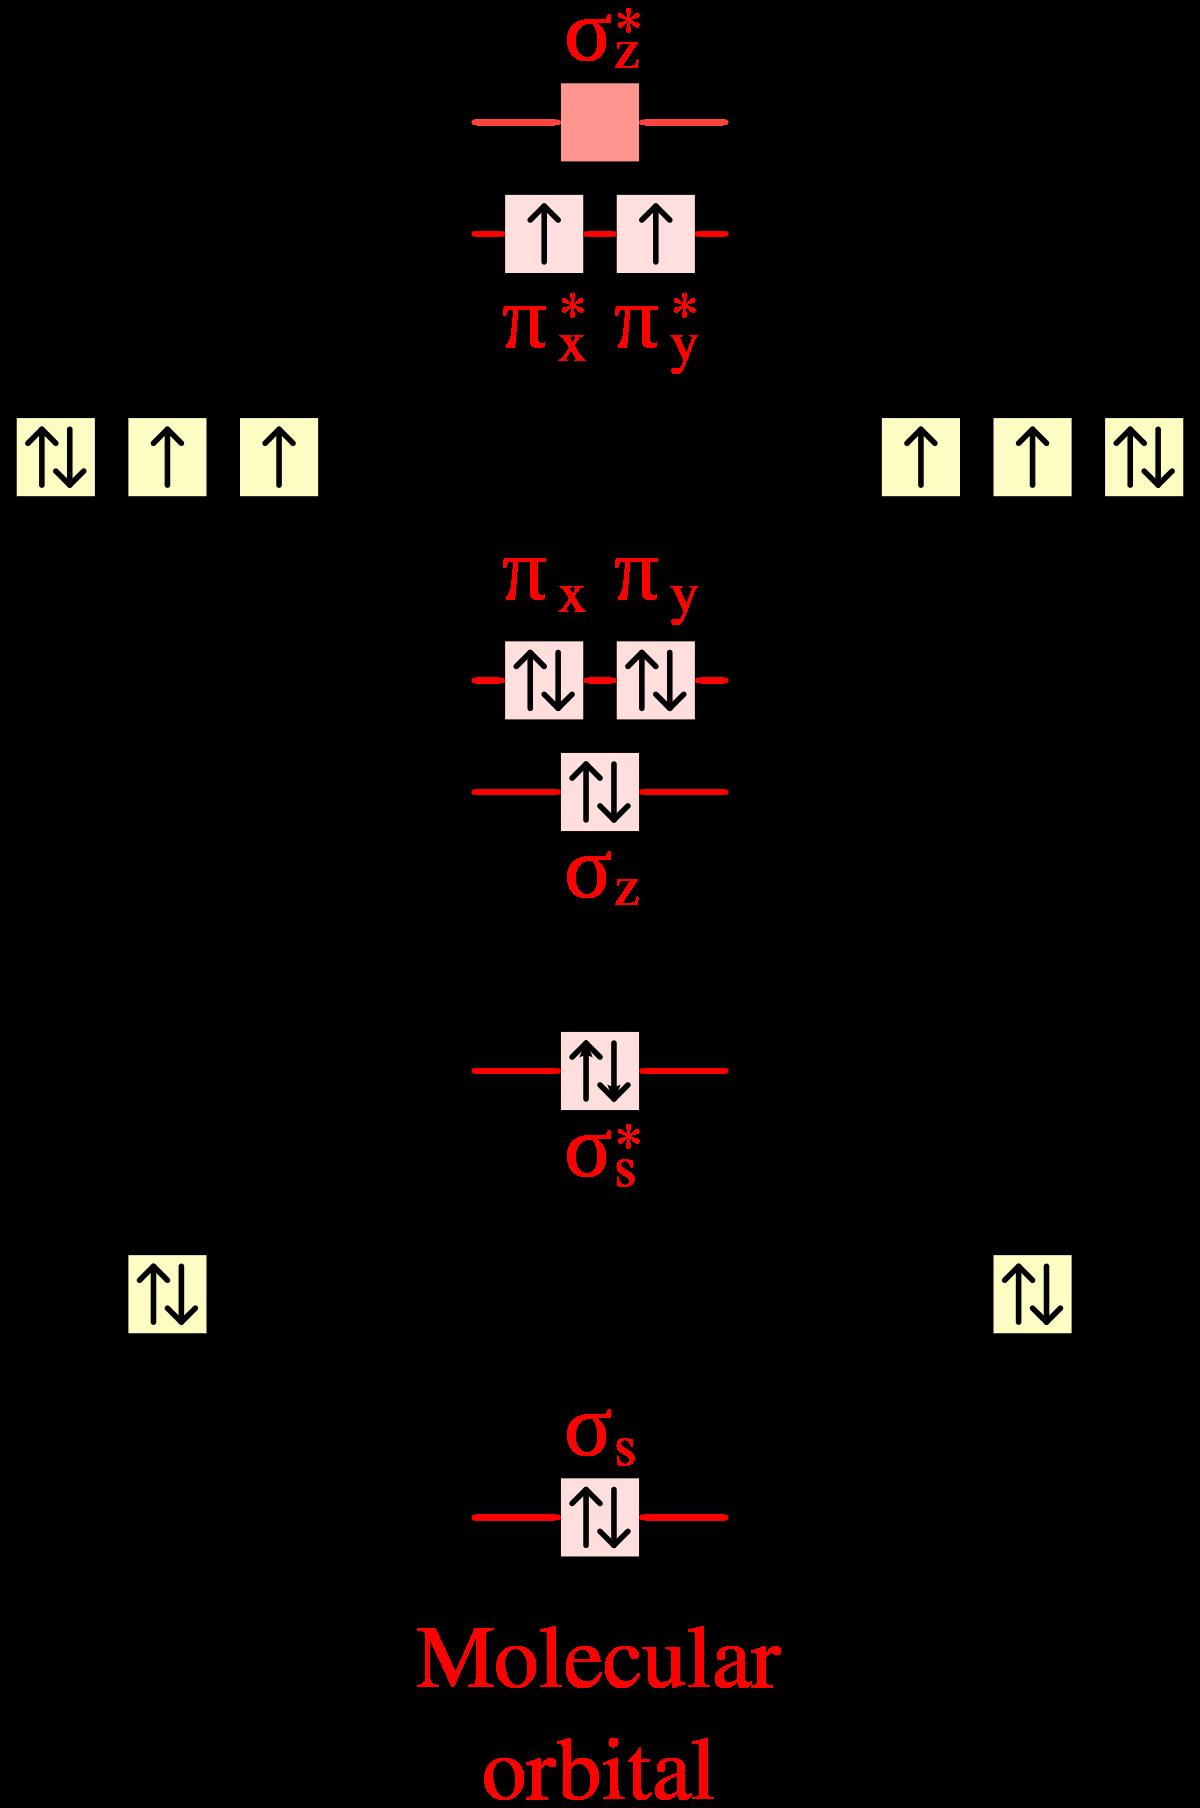 O2 molecular orbital diagram valence